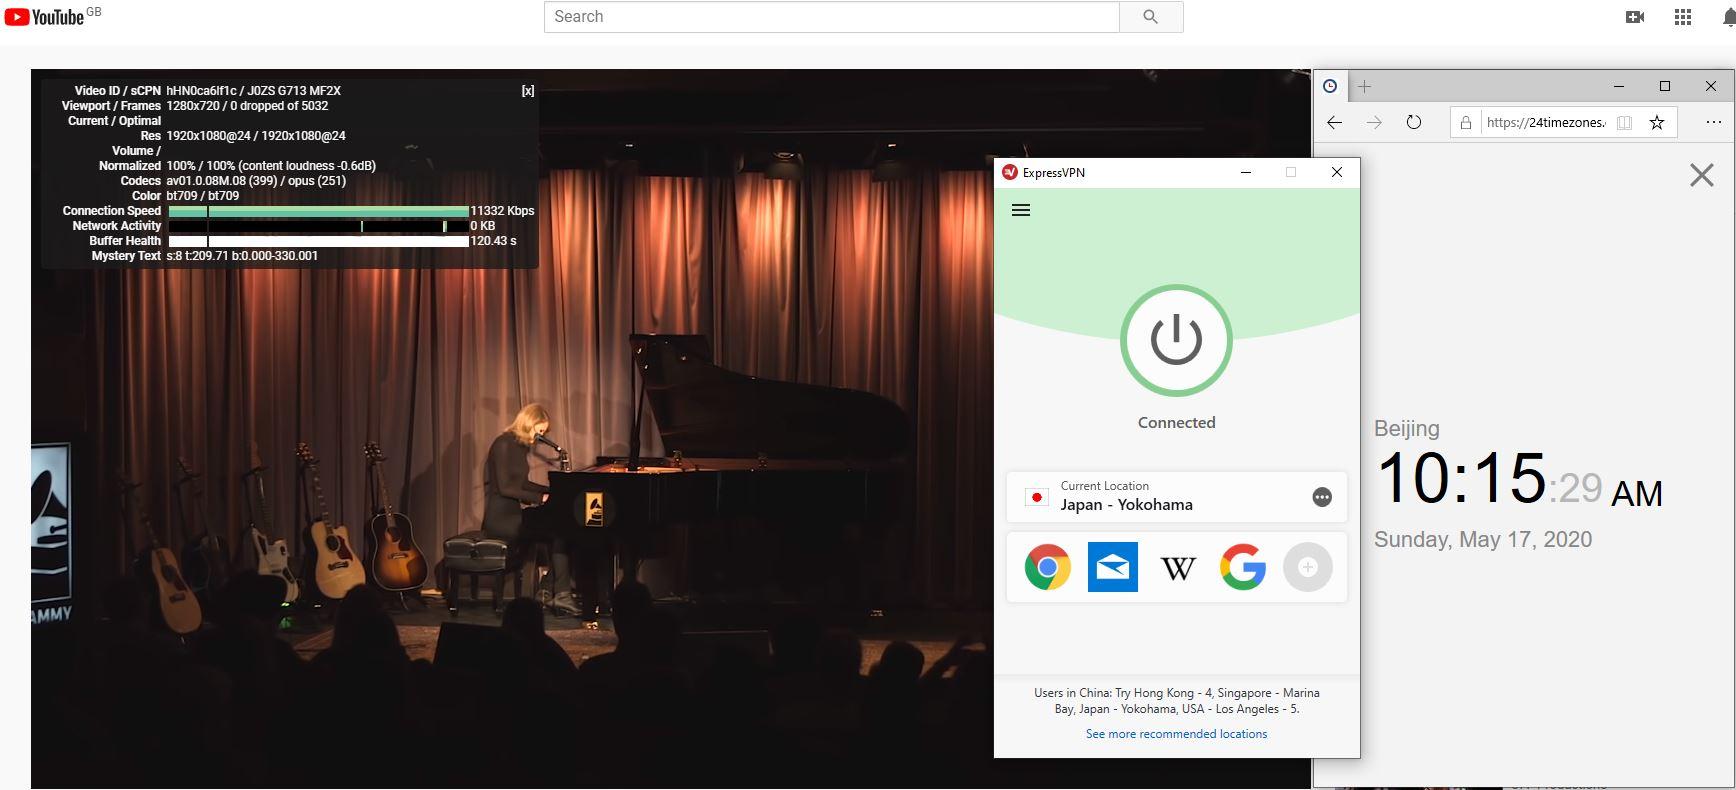 Windows10 ExpressVPN Japan - Yokohama 中国VPN 翻墙 科学上网 youtube测速-20200517